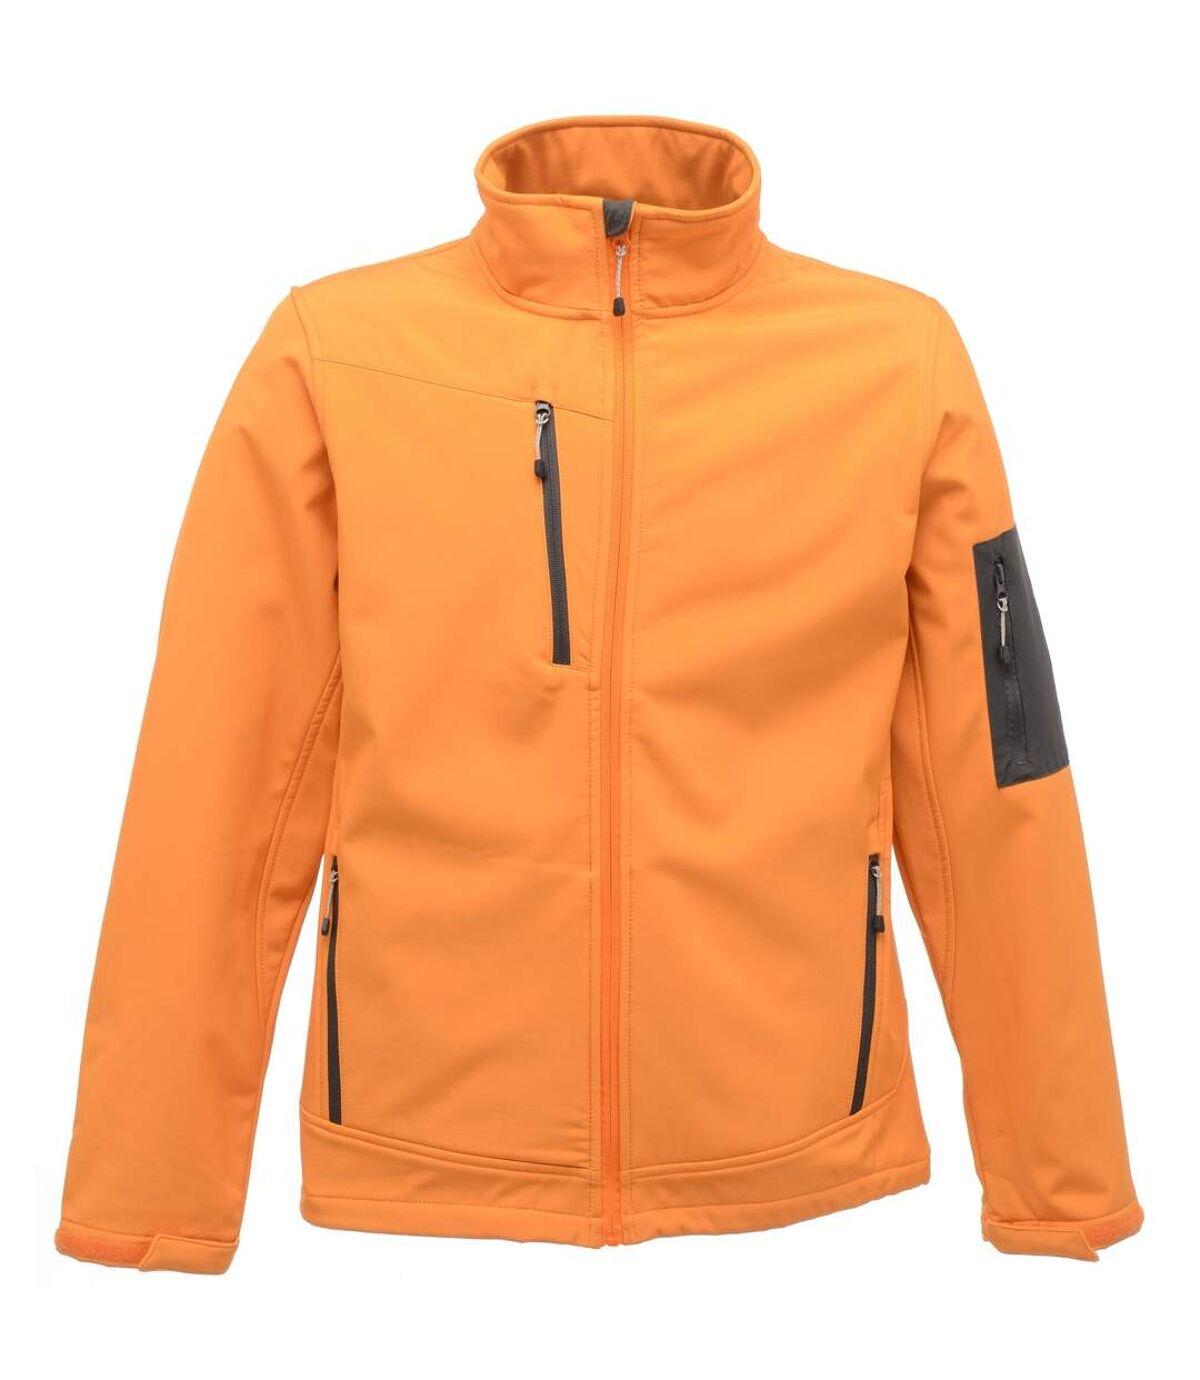 Regatta Standout Mens Arcola 3 Layer Softshell Jacket (Waterproof And Breathable) (Sun Orange / Seal Grey) - UTRW3691